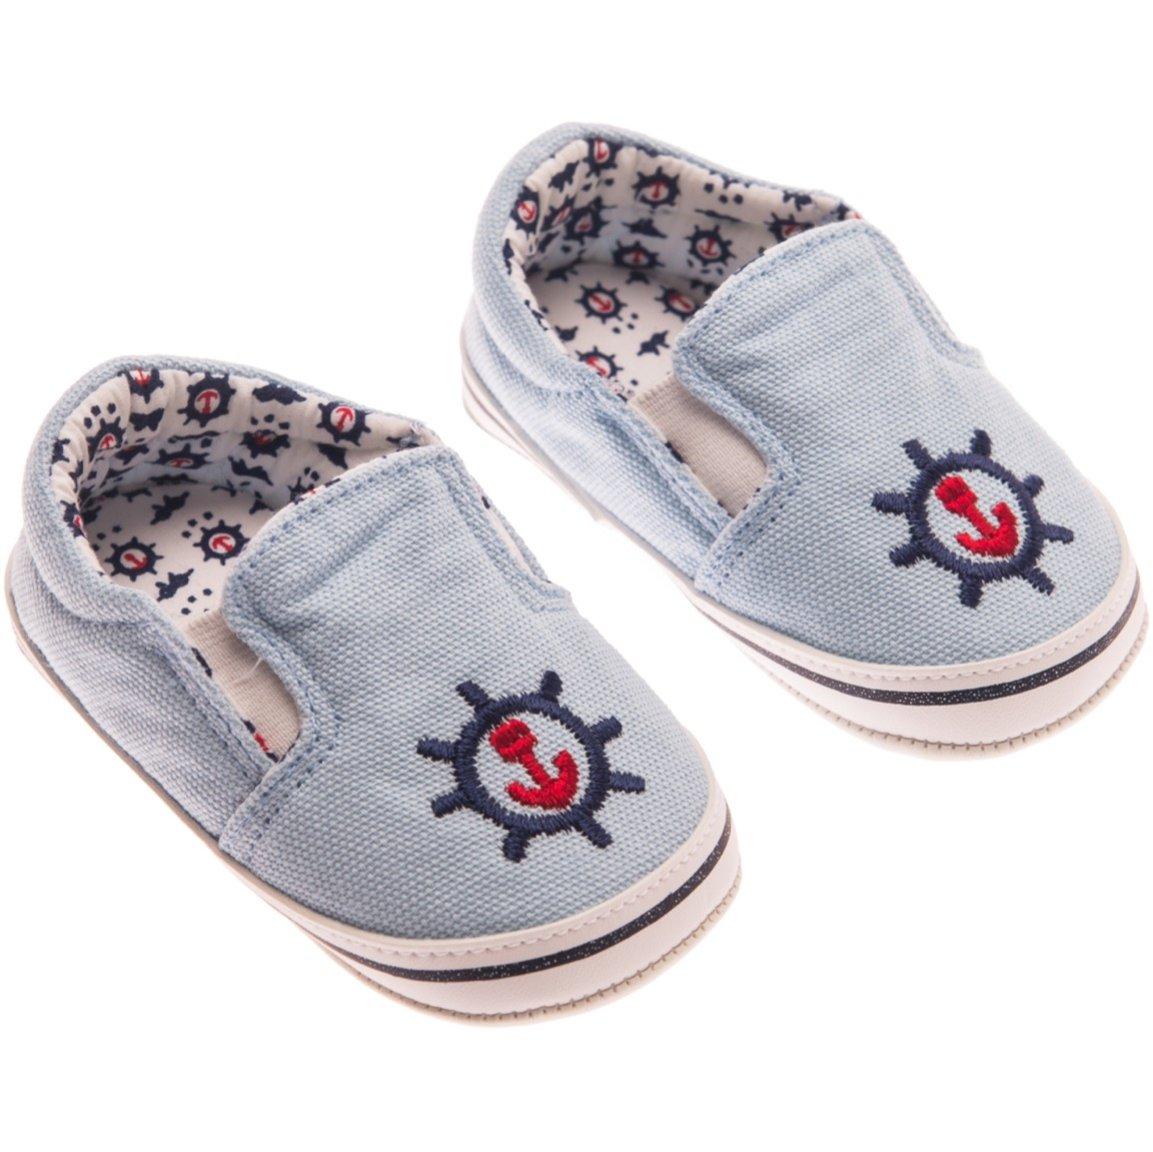 Funny Baby βρεφικά παπουτσάκια αγκαλιάς «Anchor»